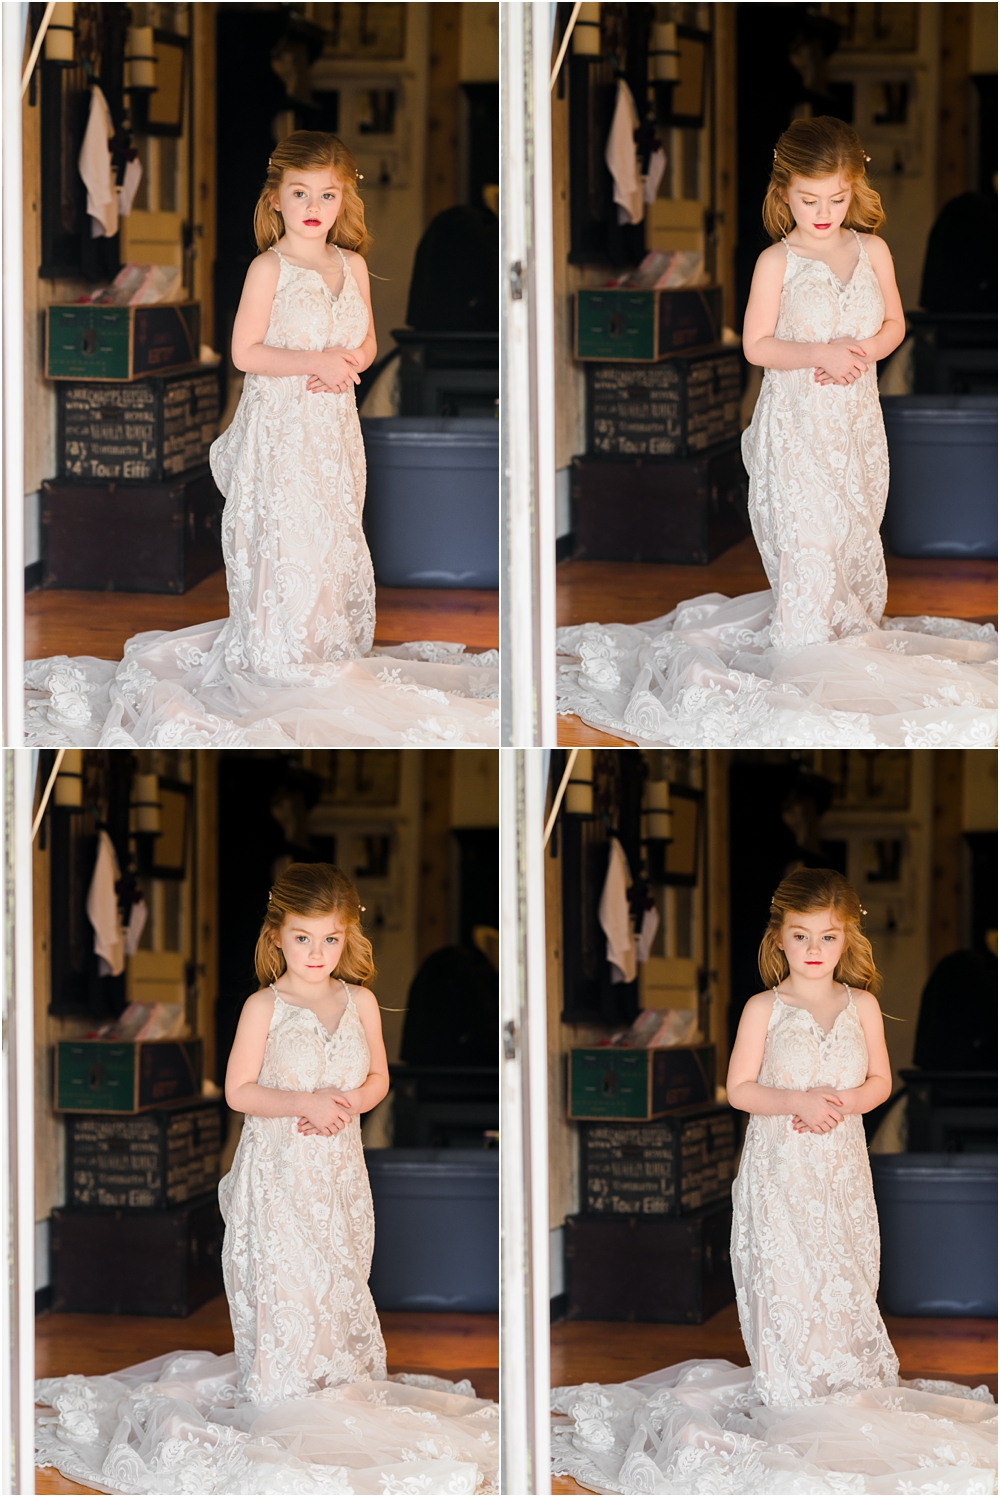 baton-rouge-gabrielle-house-wedding-kiersten-stevenson-photography-26.jpg